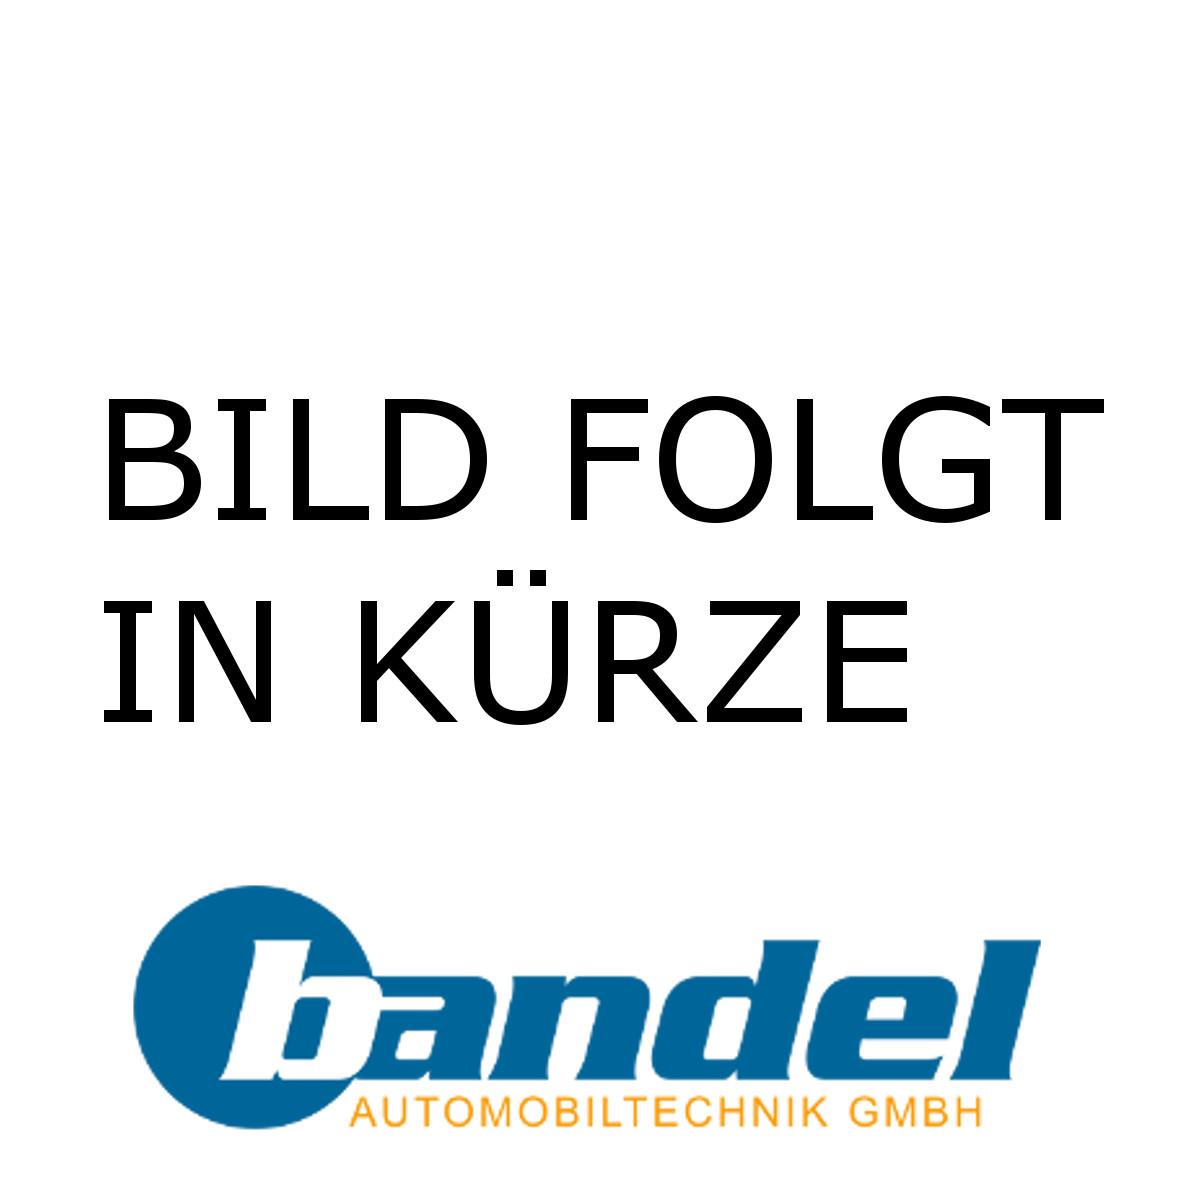 ATE BREMSSCHEIBEN + BREMSBELÄGE HINTEN VW GOLF 4 IV auch Variant / Kombi 1J1 1J5 Pic:3